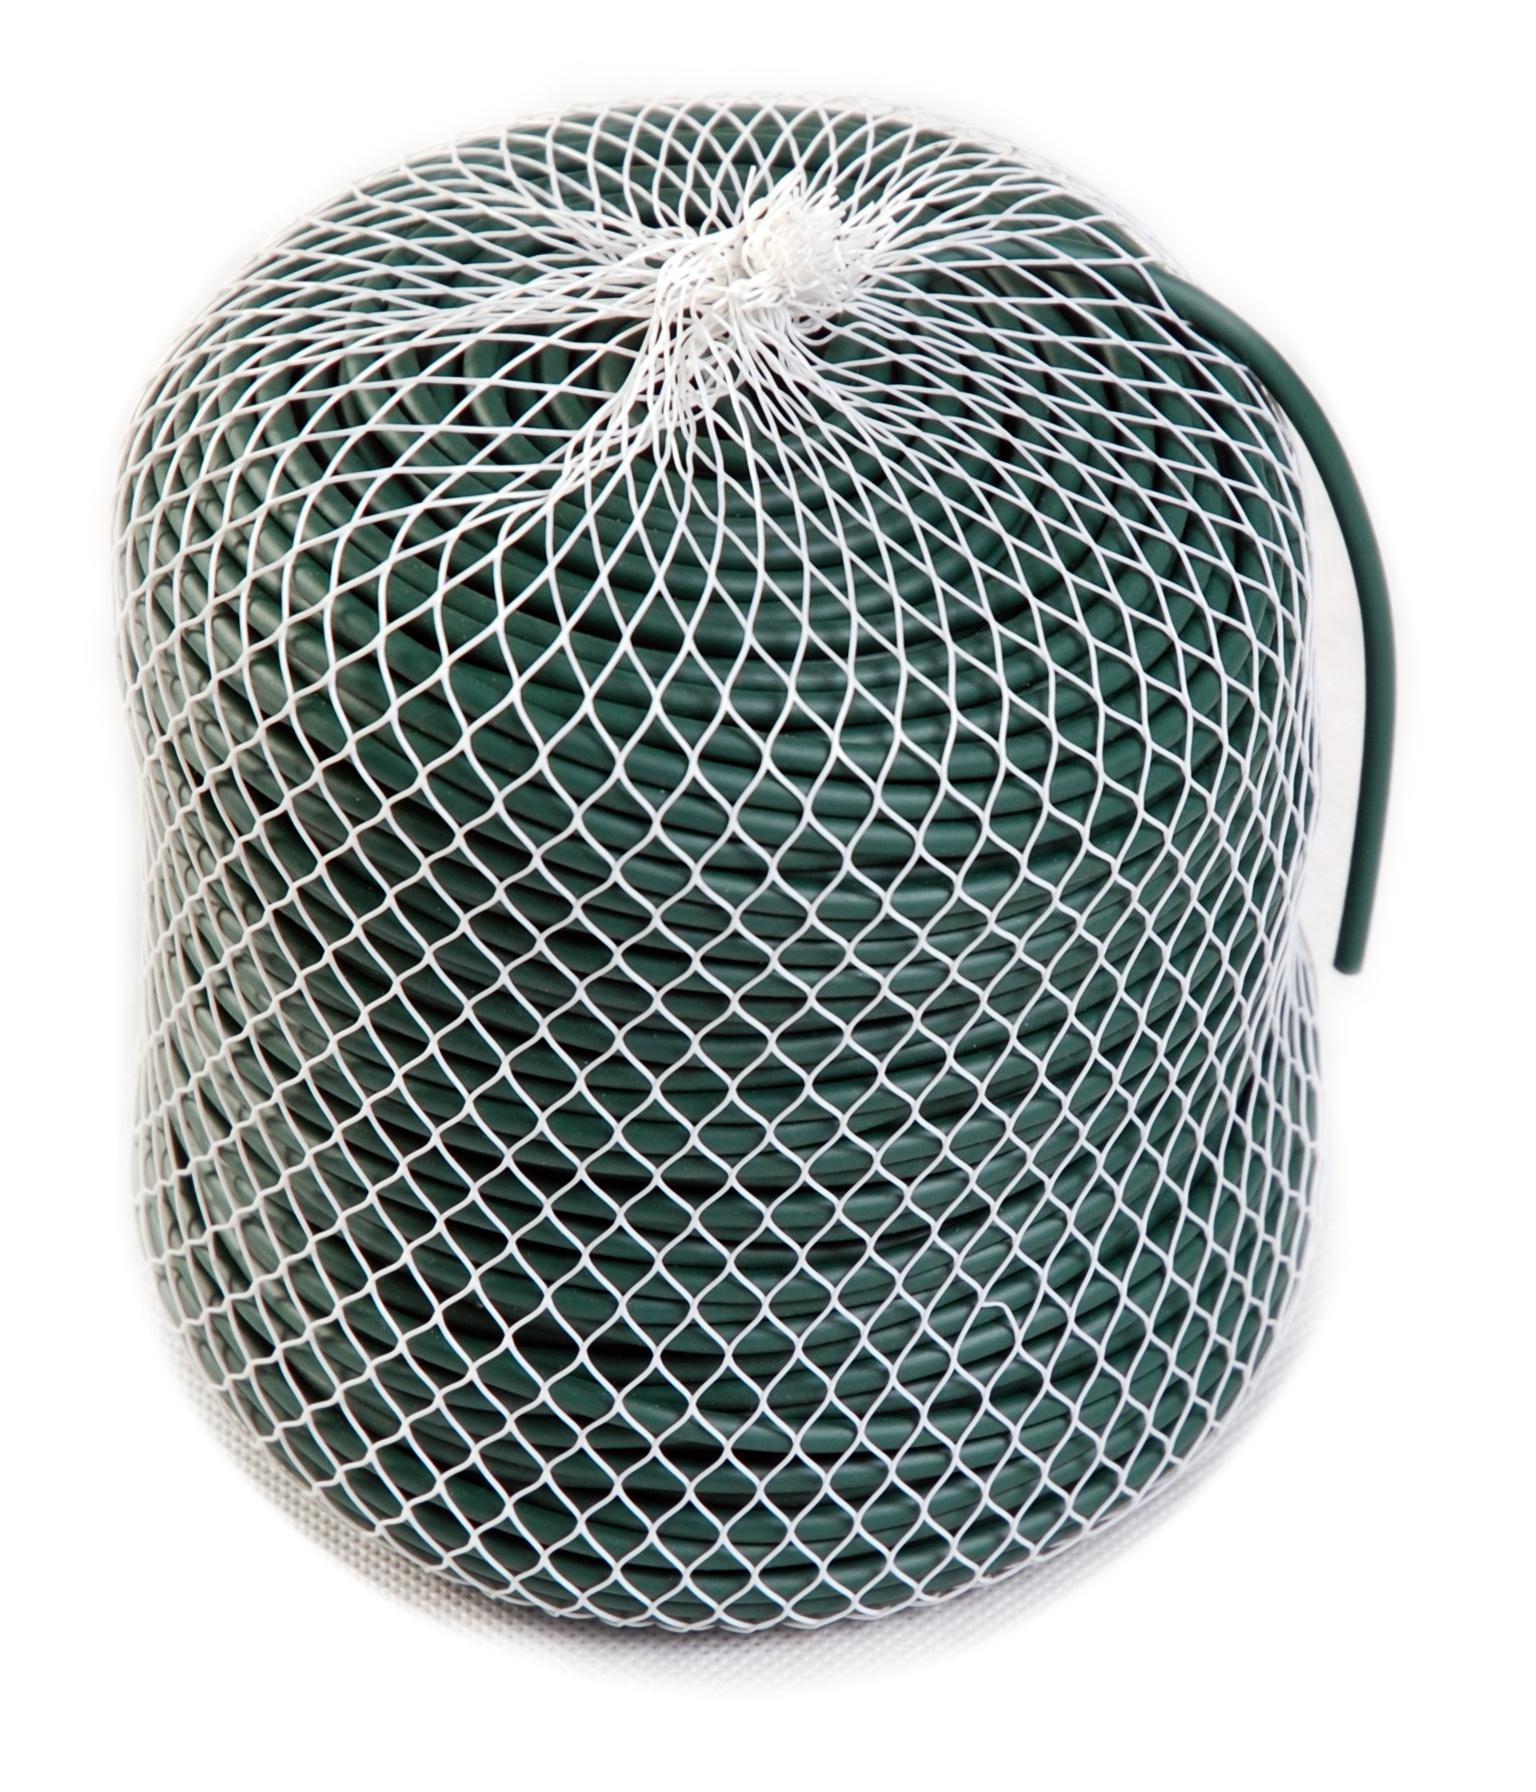 Кембрик для сада и огорода 0,5 и 0,9 кг